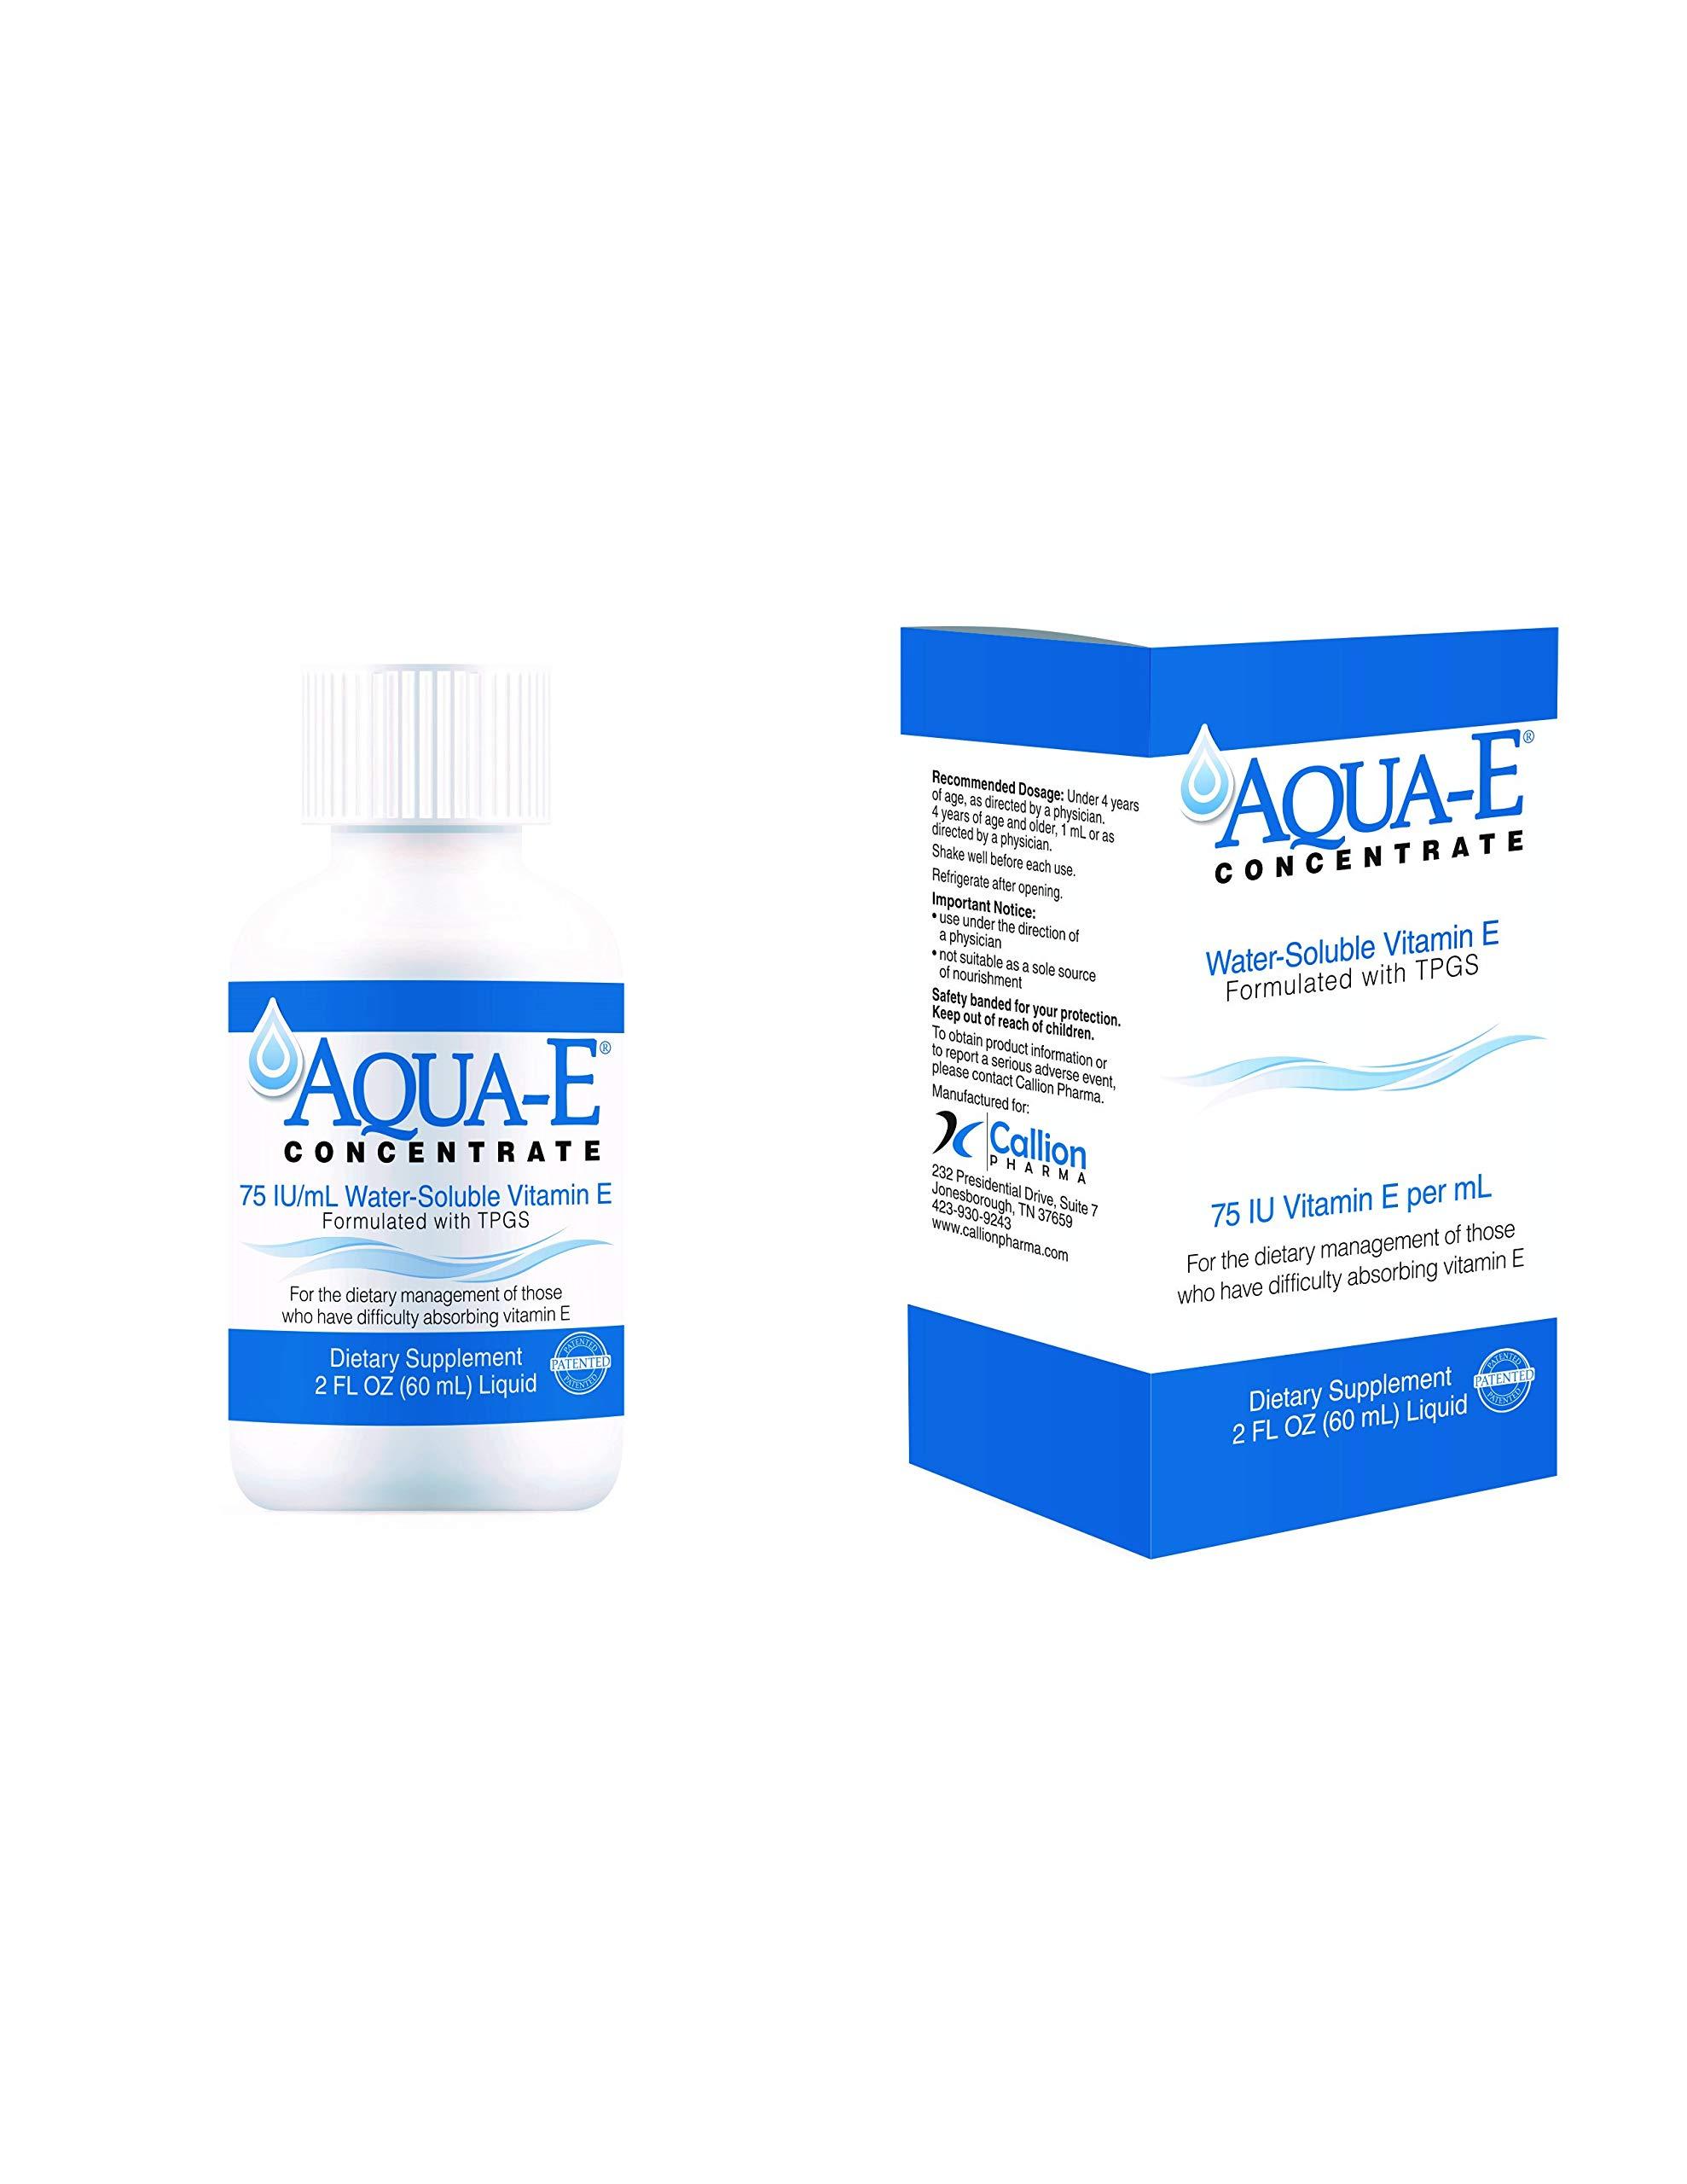 Aqua-E Concentrate 75 IU/ml, 60 ml Bottle